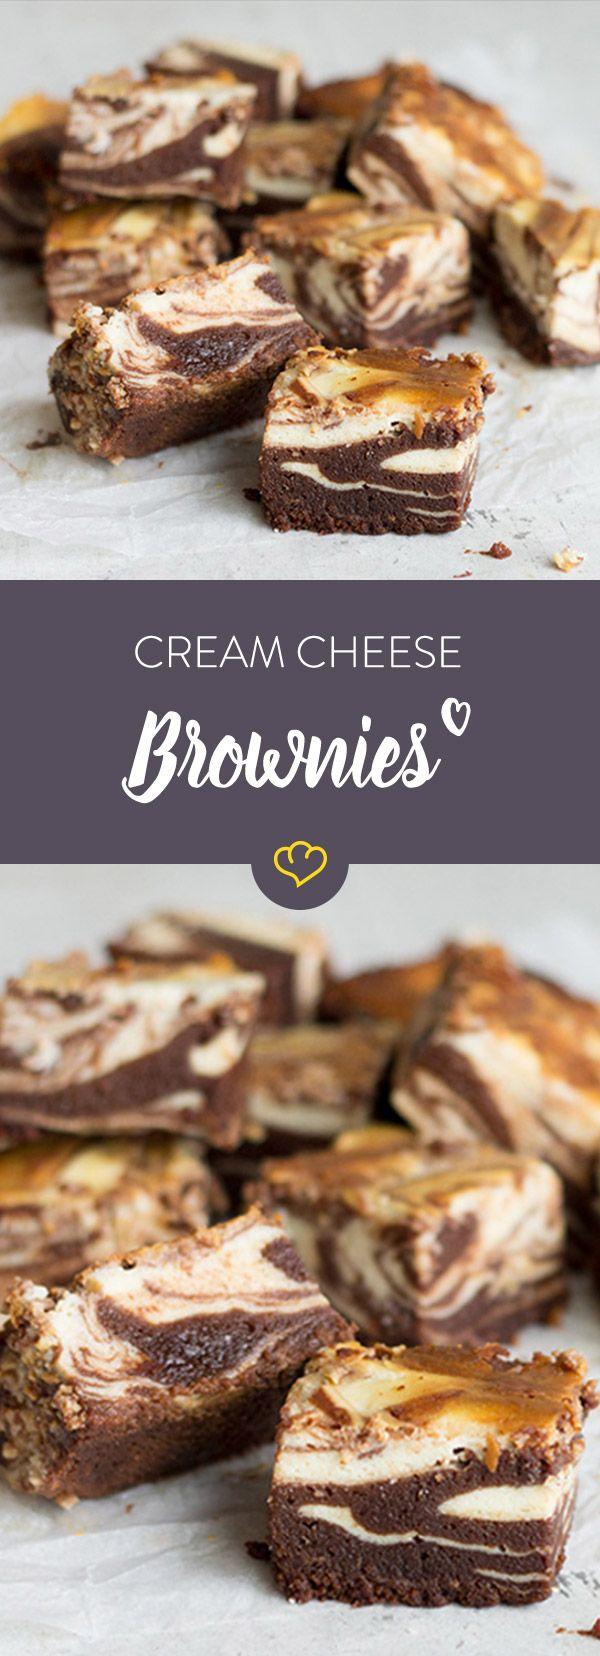 Photo of Cream cheese brownies